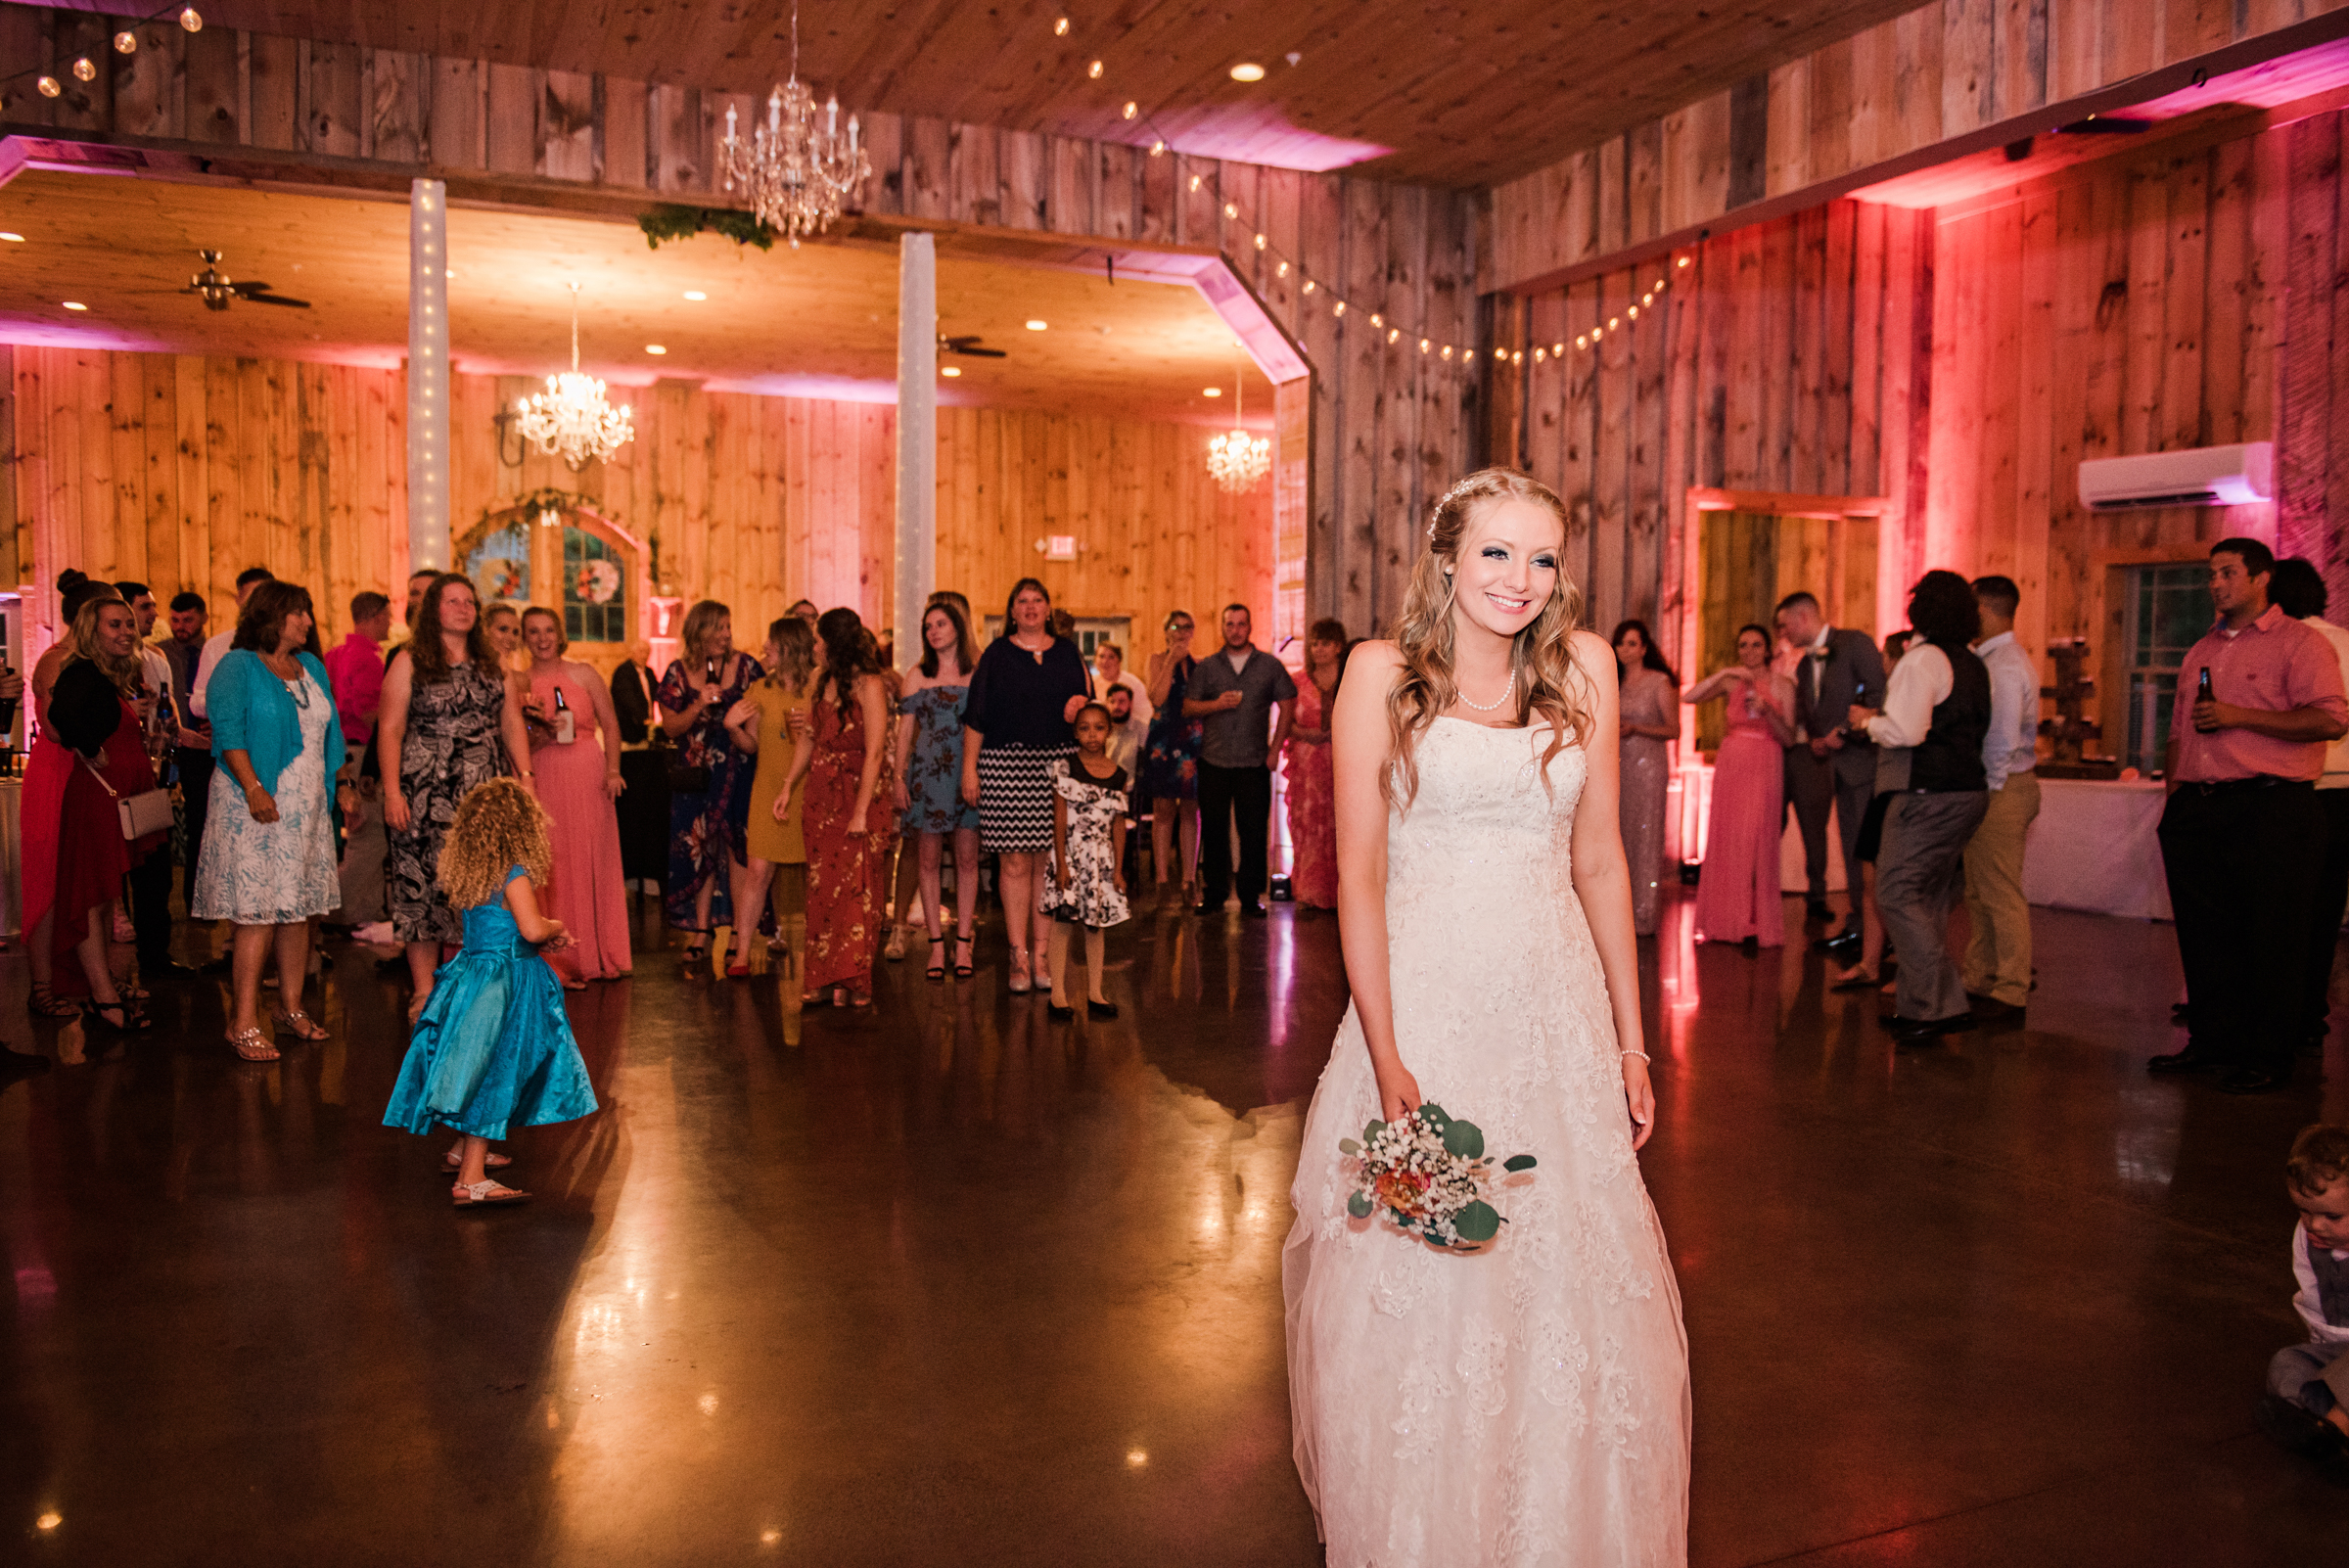 Wolf_Oak_Acres_Central_NY_Wedding_JILL_STUDIO_Rochester_NY_Photographer_DSC_9078.jpg